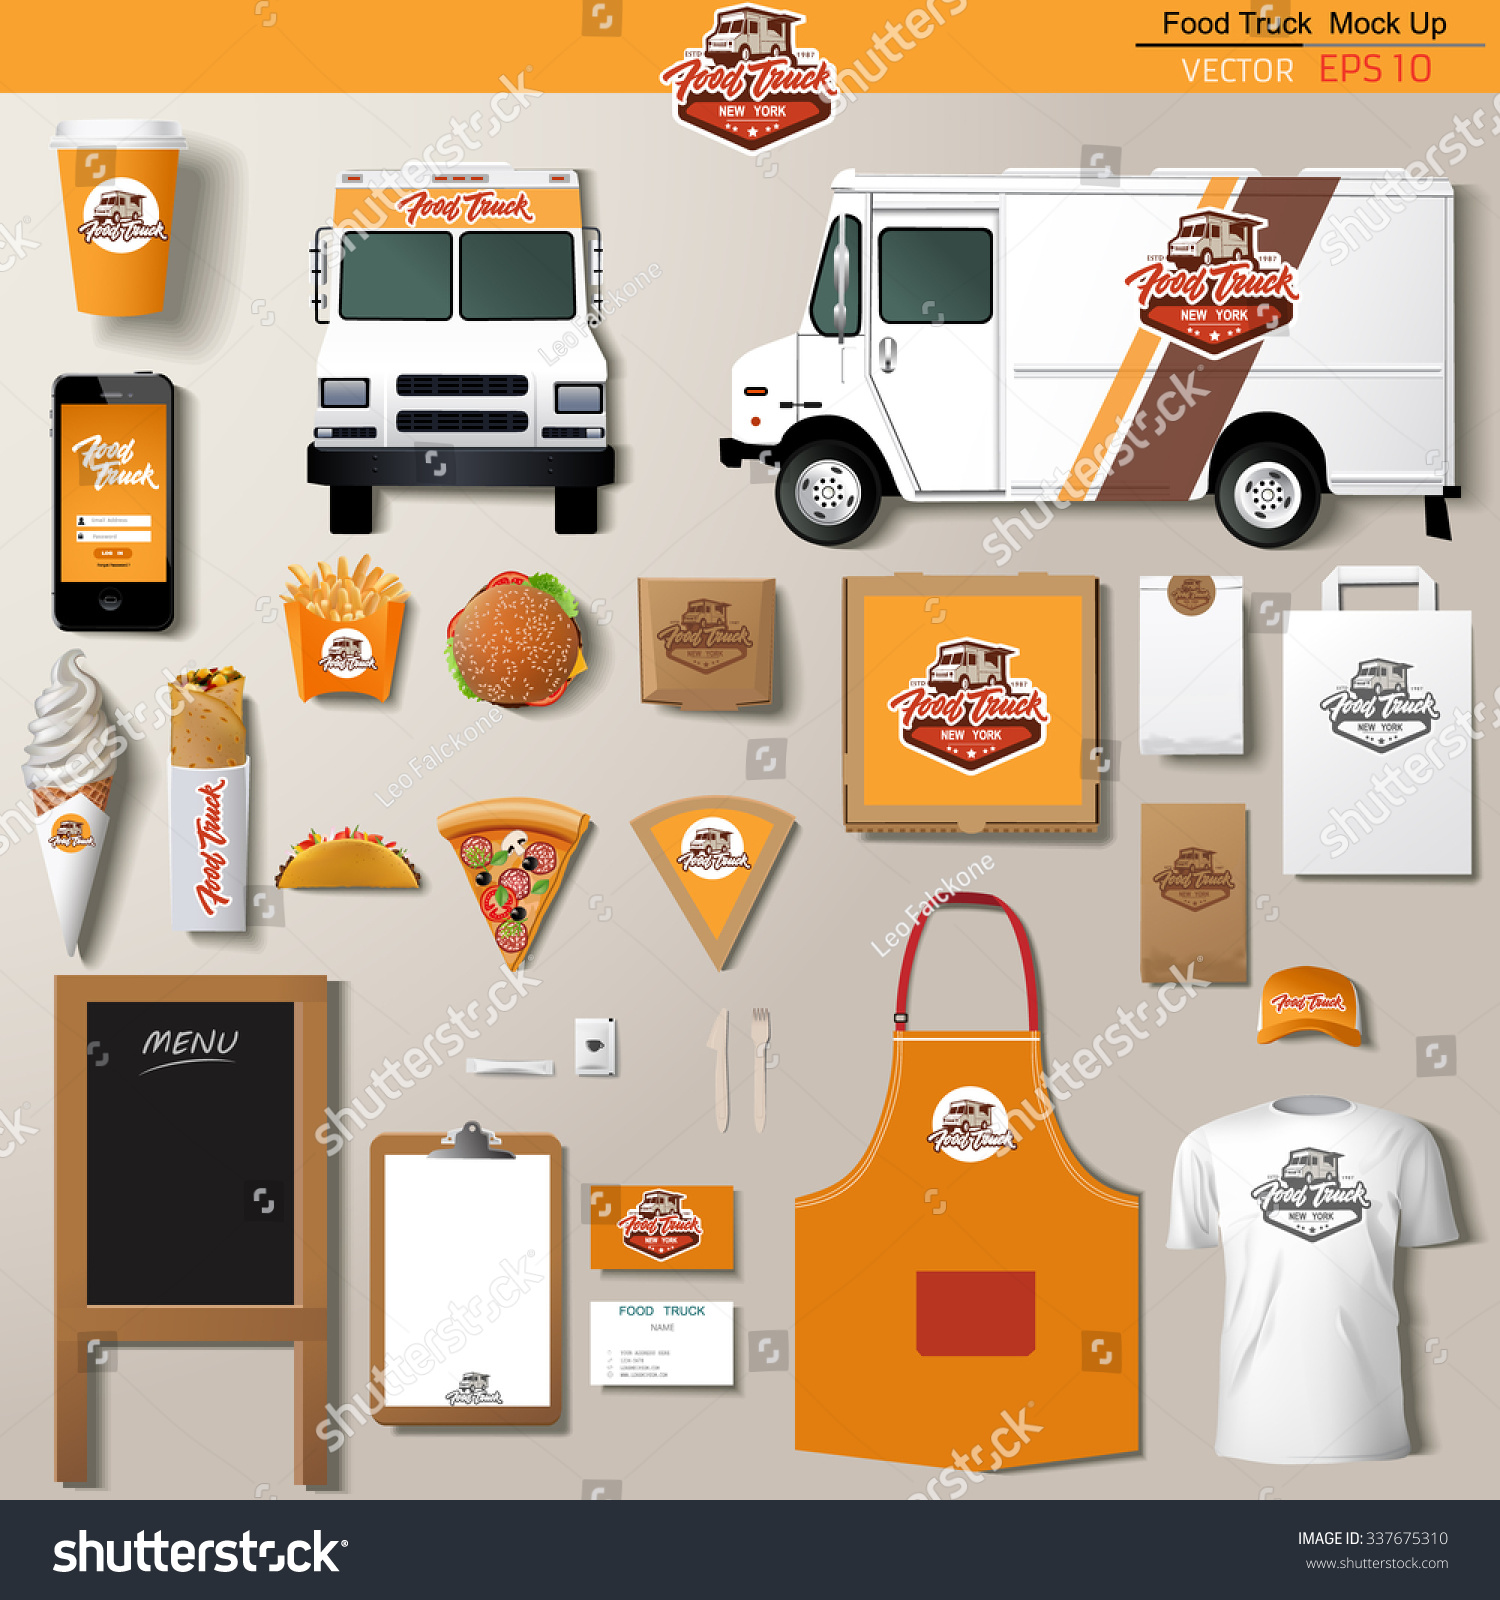 vector food truck corporate identity template stock vector 337675310 shutterstock. Black Bedroom Furniture Sets. Home Design Ideas